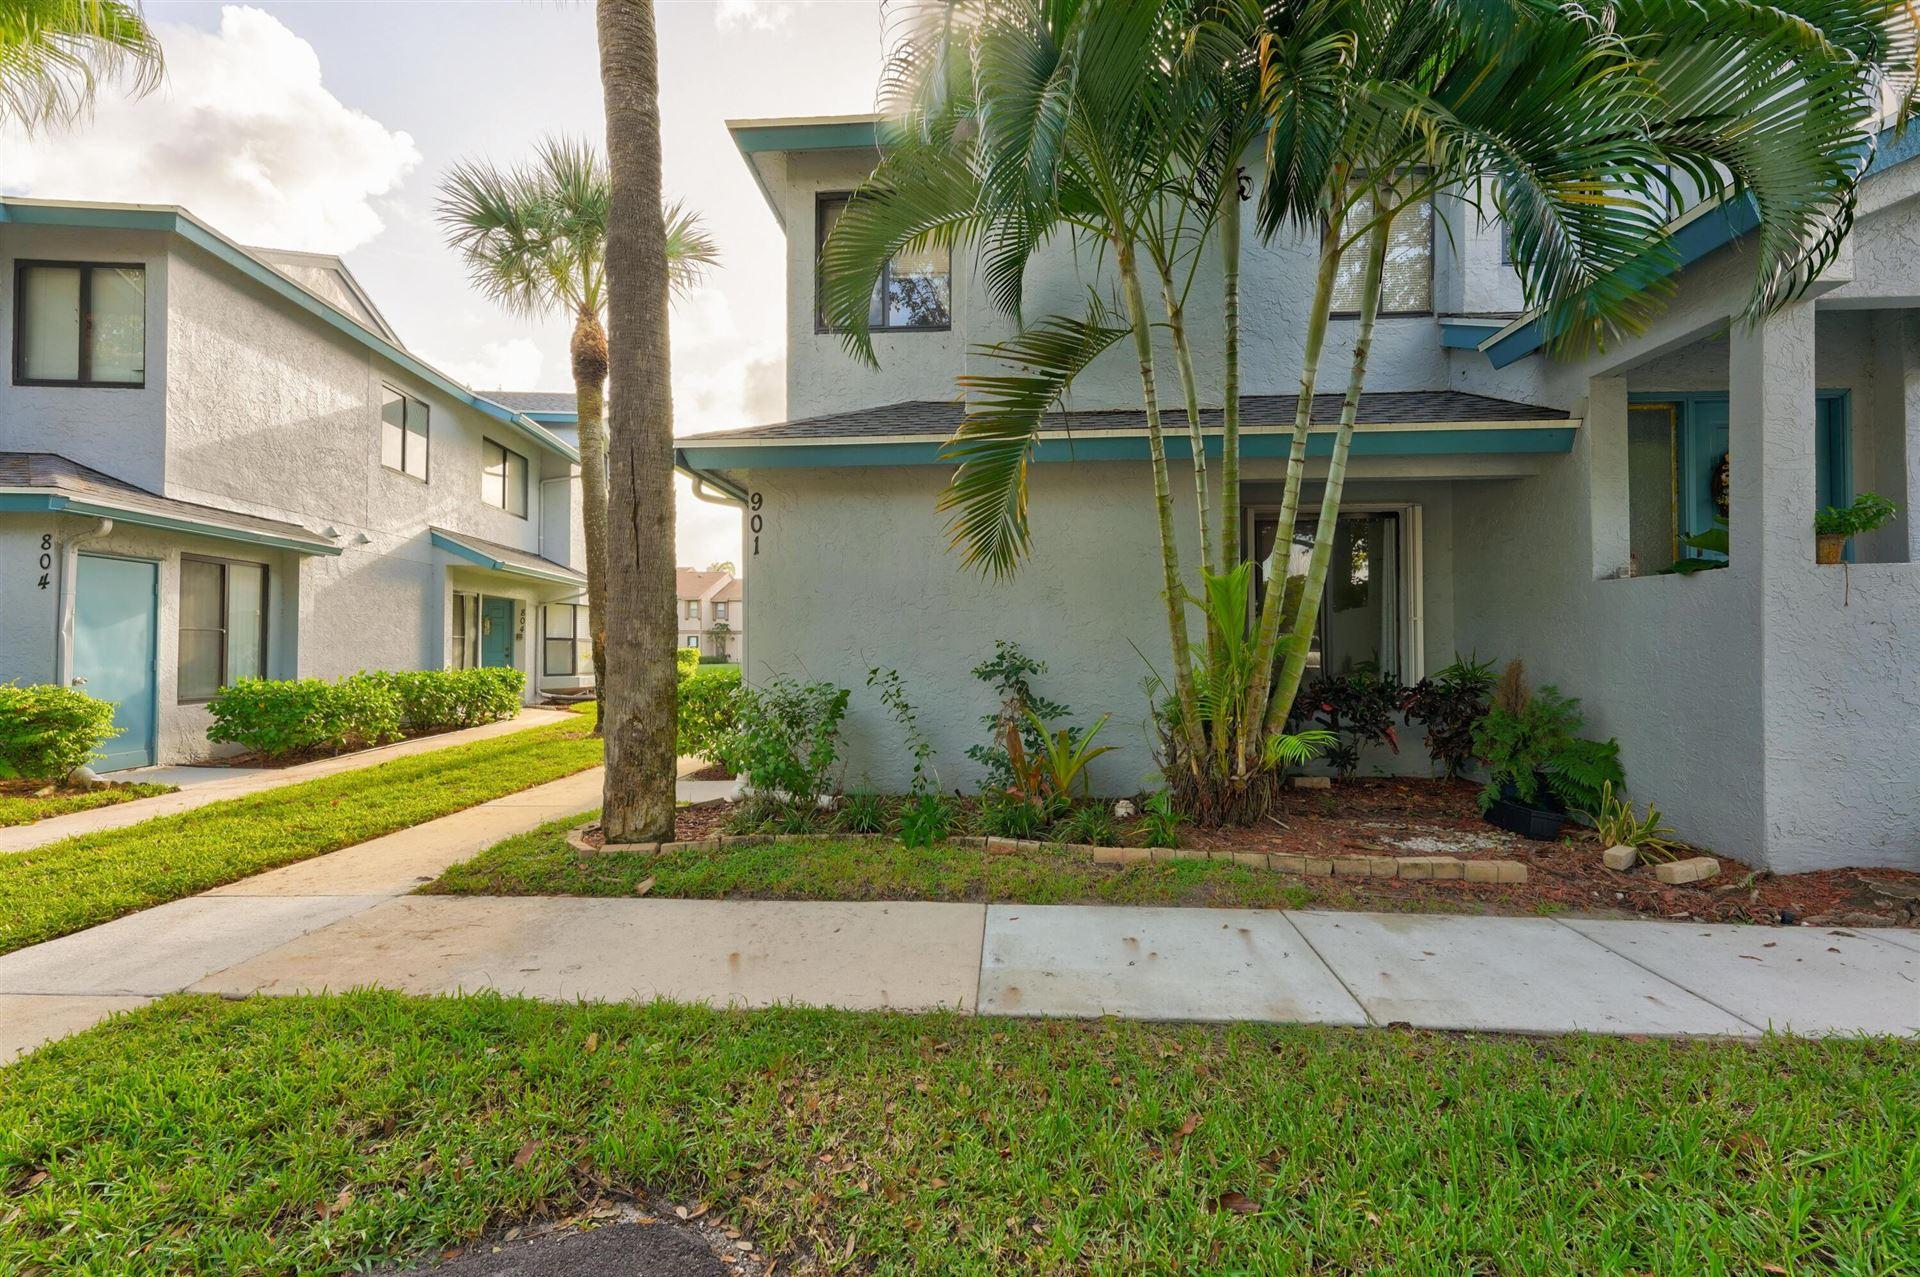 901 Harbour Pointe Way, Greenacres, FL 33413 - MLS#: RX-10741365